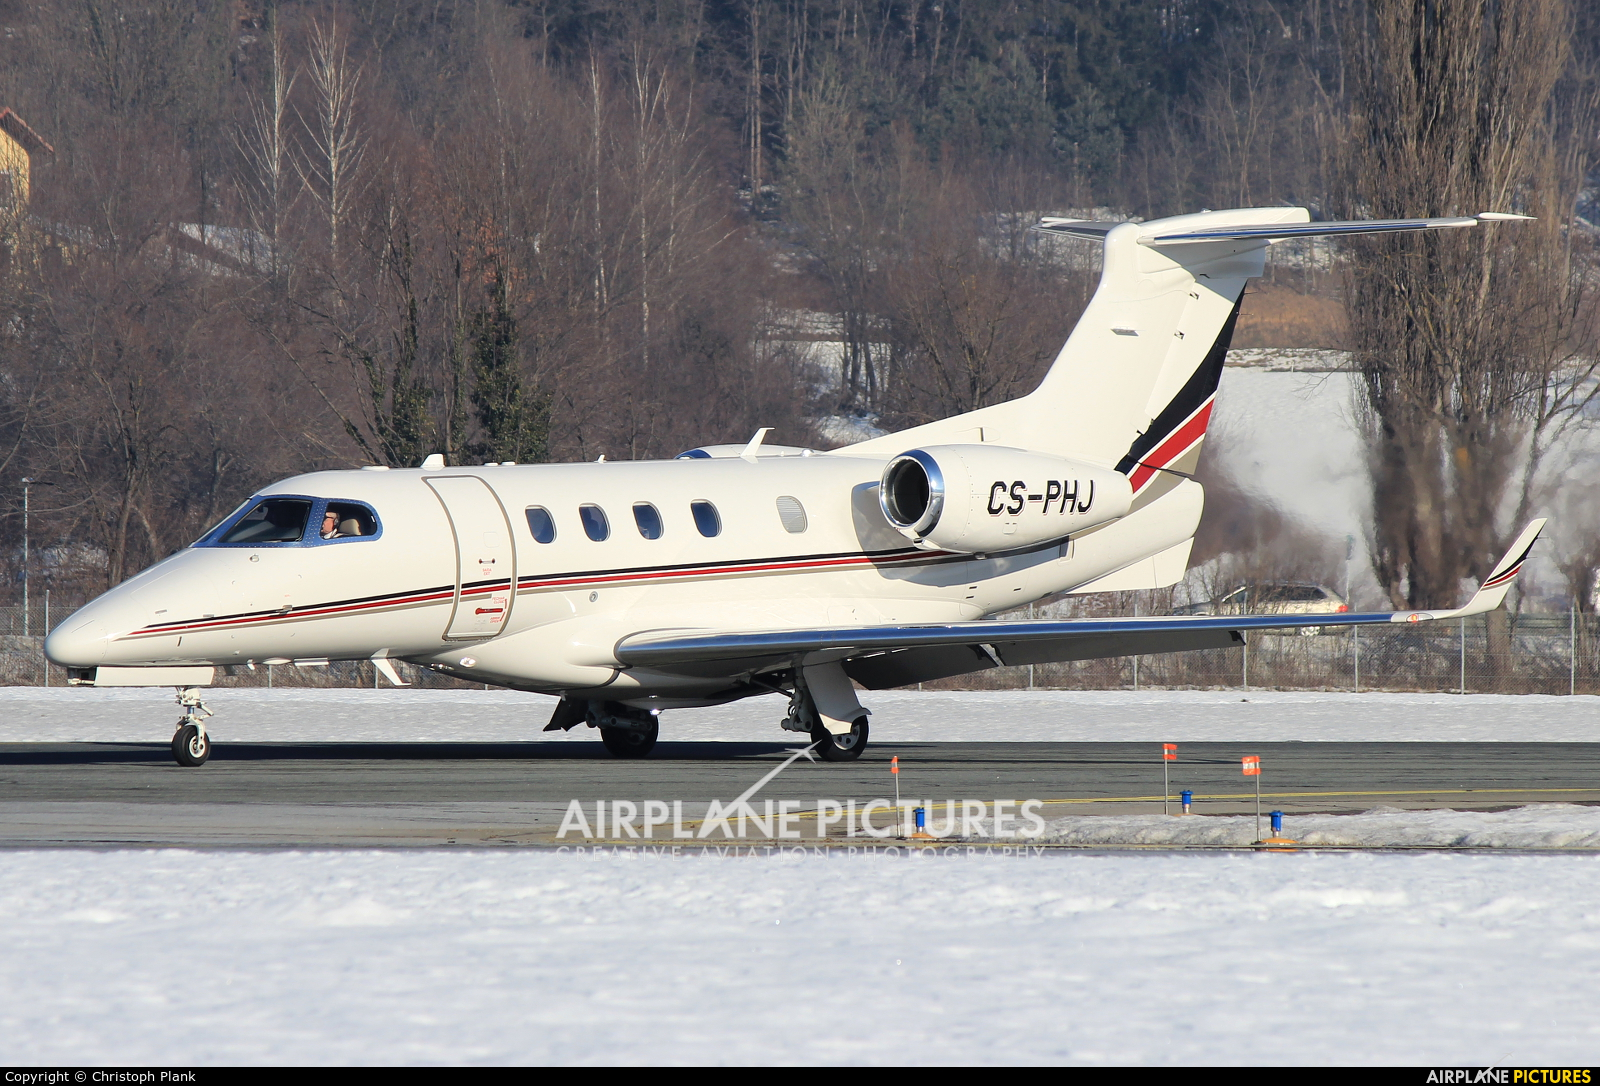 NetJets Europe (Portugal) CS-PHJ aircraft at Innsbruck